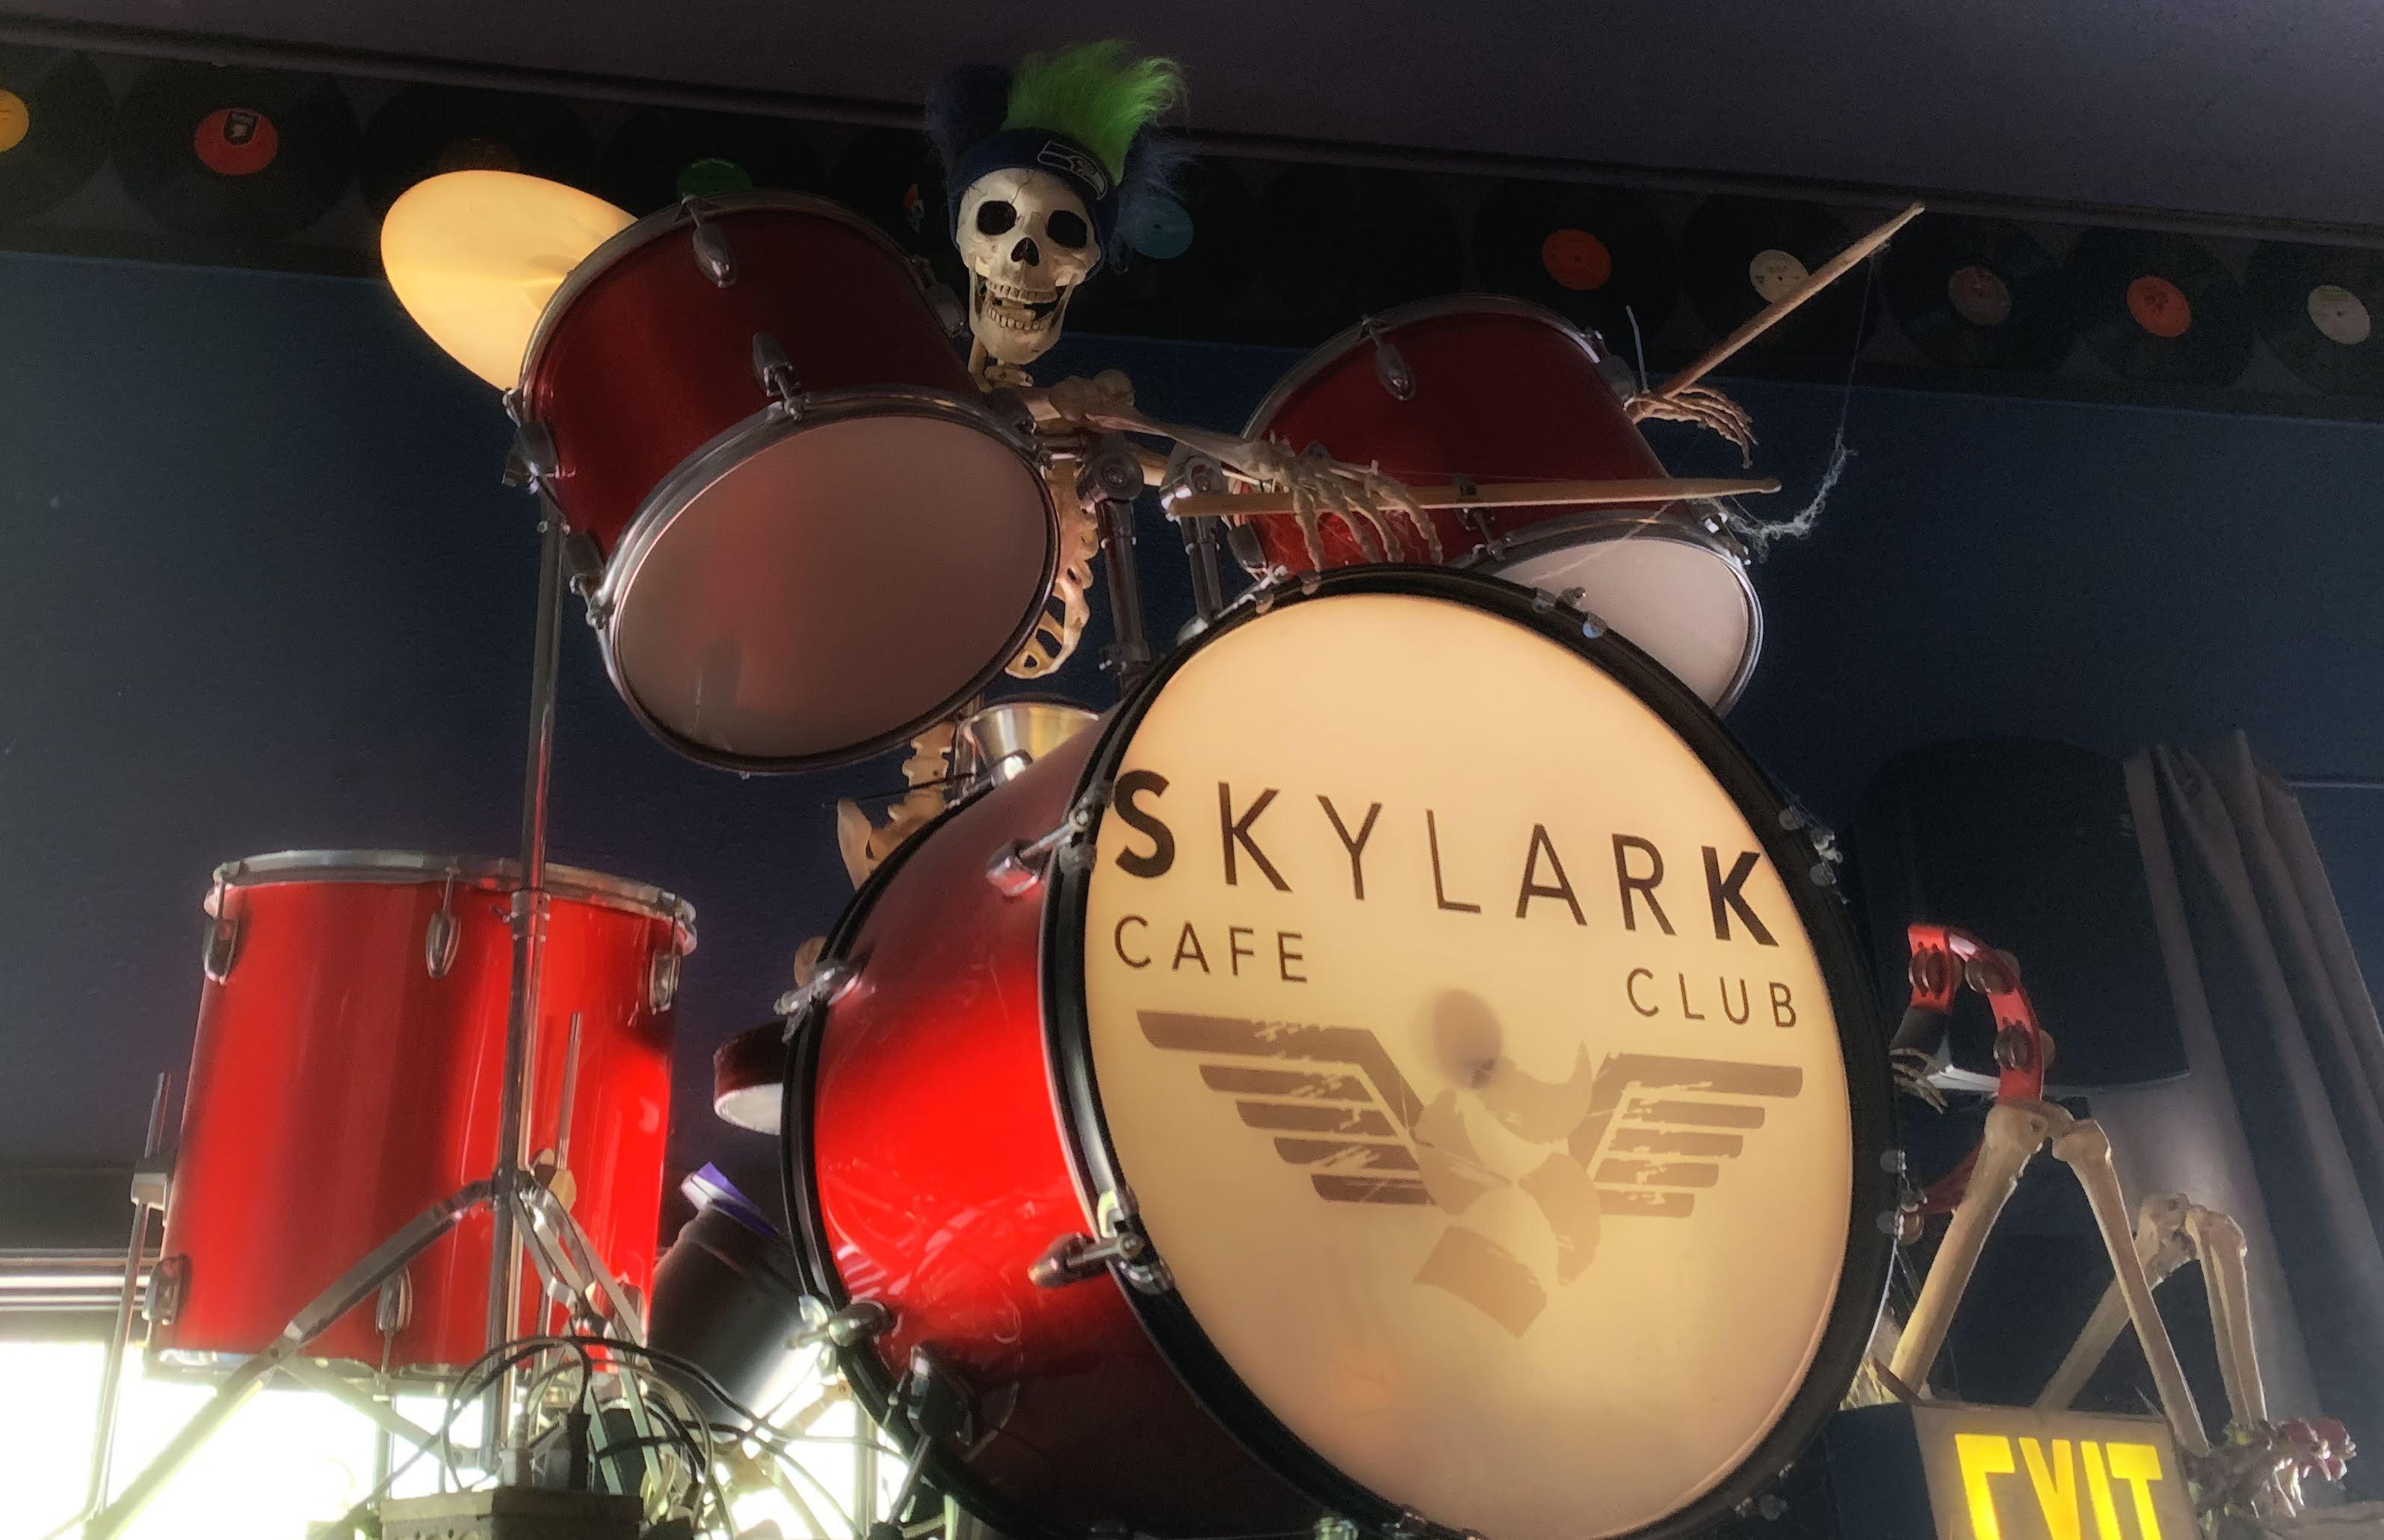 skylark cafe west seattle pidgeon point